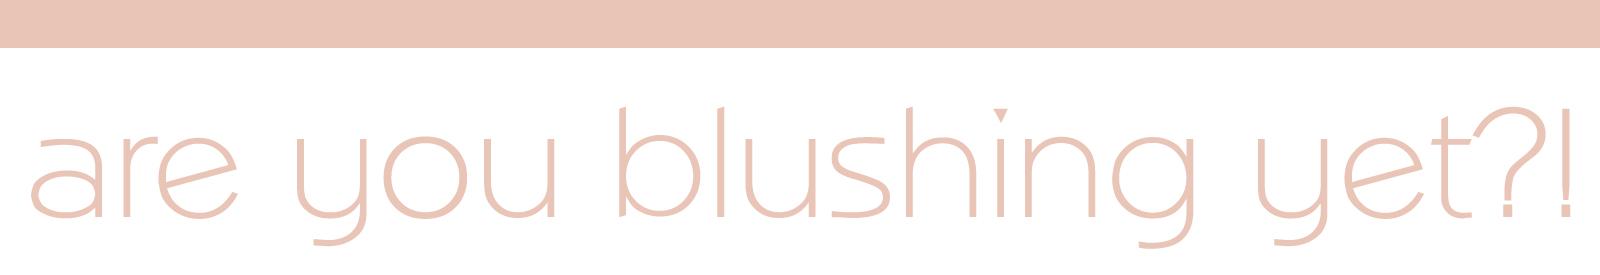 16-5-23-blush-tile4